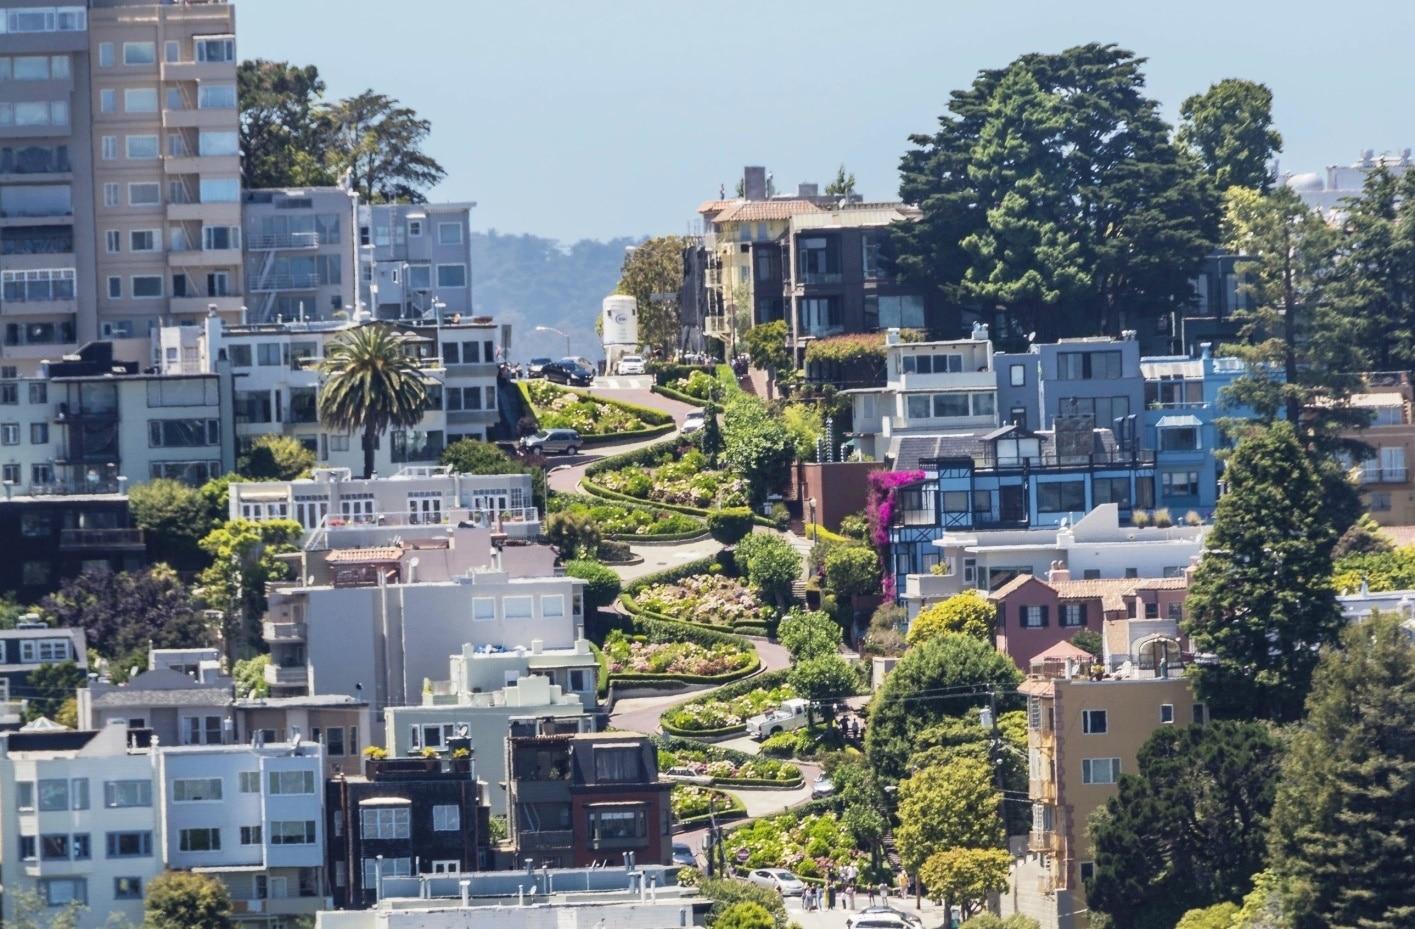 The zigzag street in San Francisco